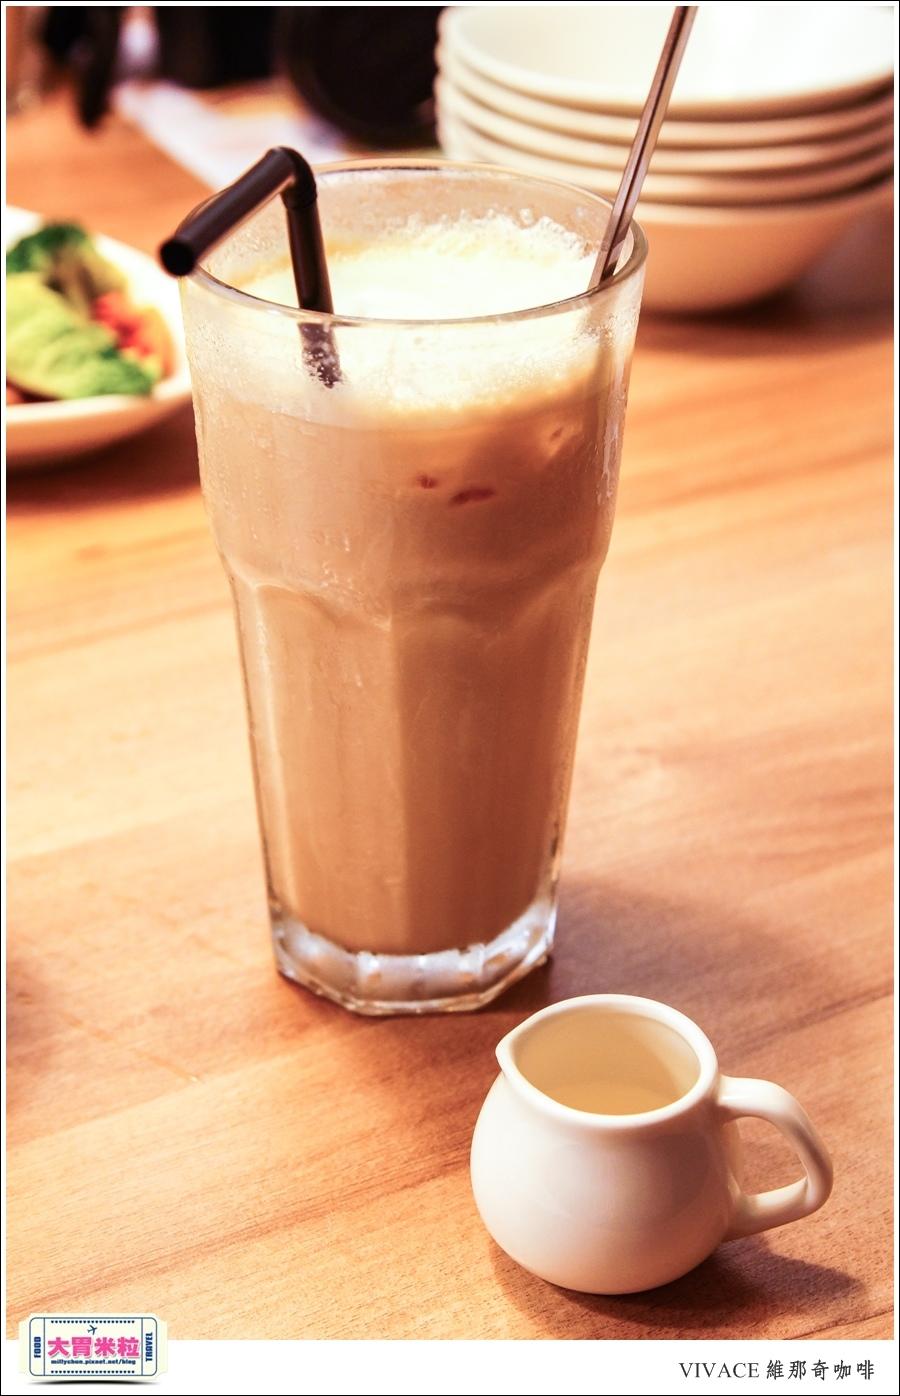 Hellmann's 康寶美玉白汁全台美味沙拉之旅x維那奇VIVACE咖啡@高雄早午餐推薦@大胃米粒0026.jpg